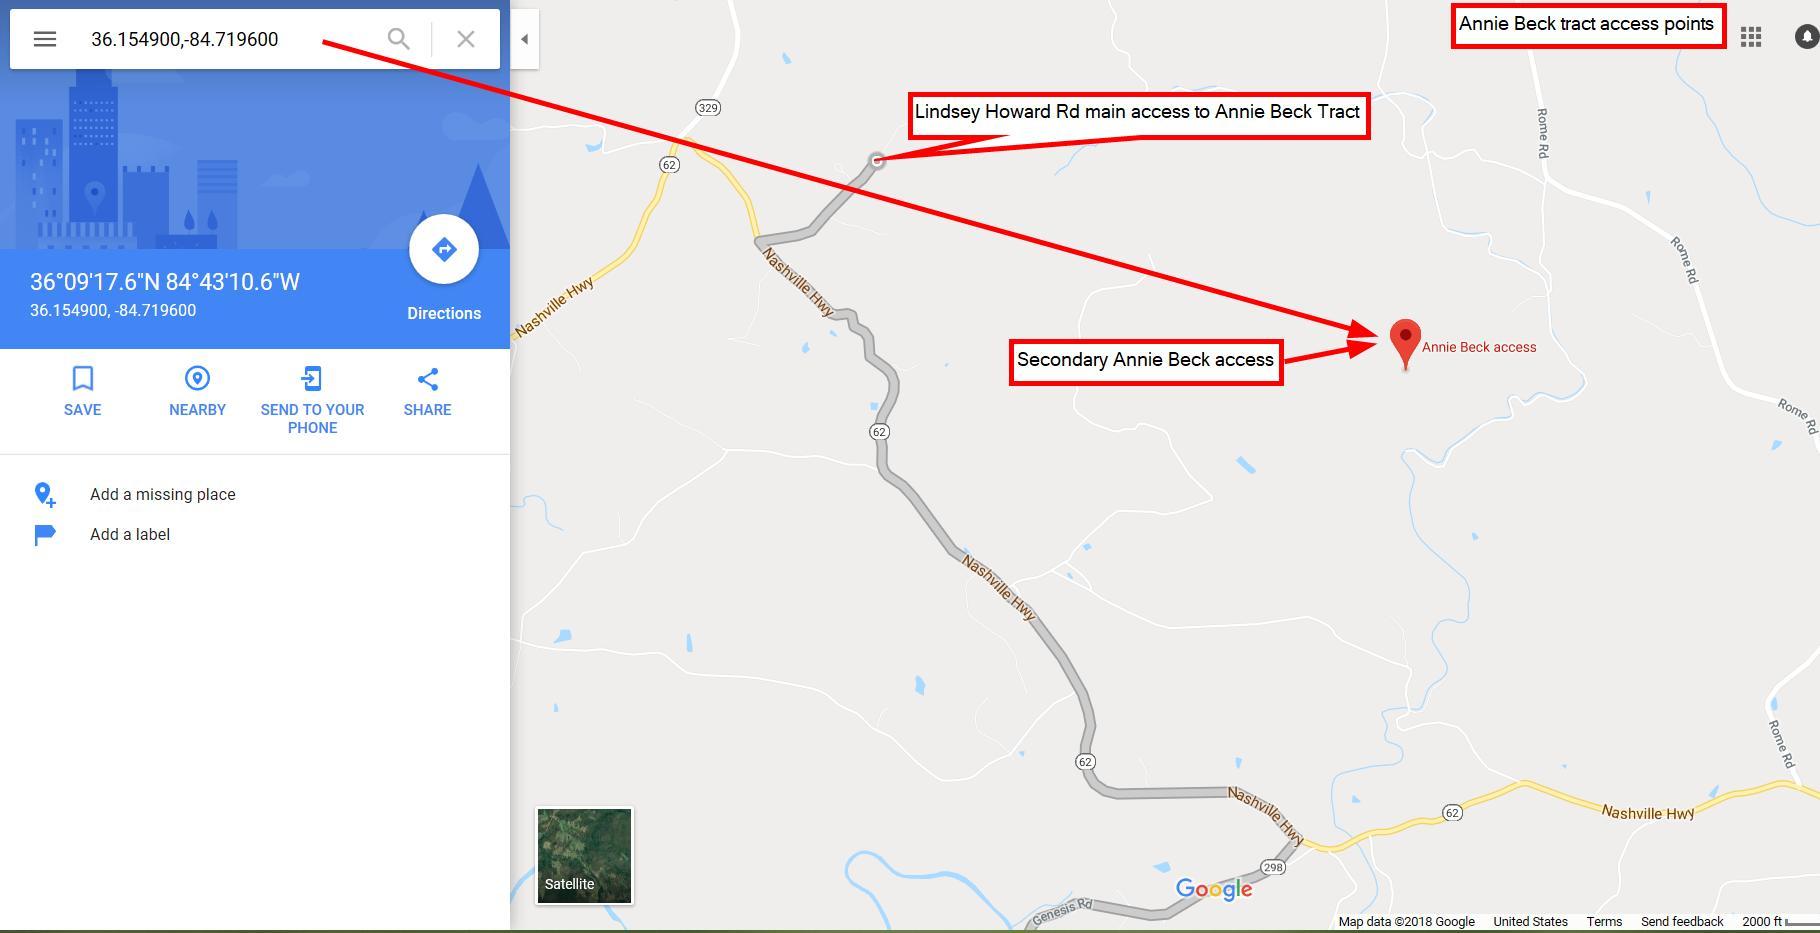 Google access map